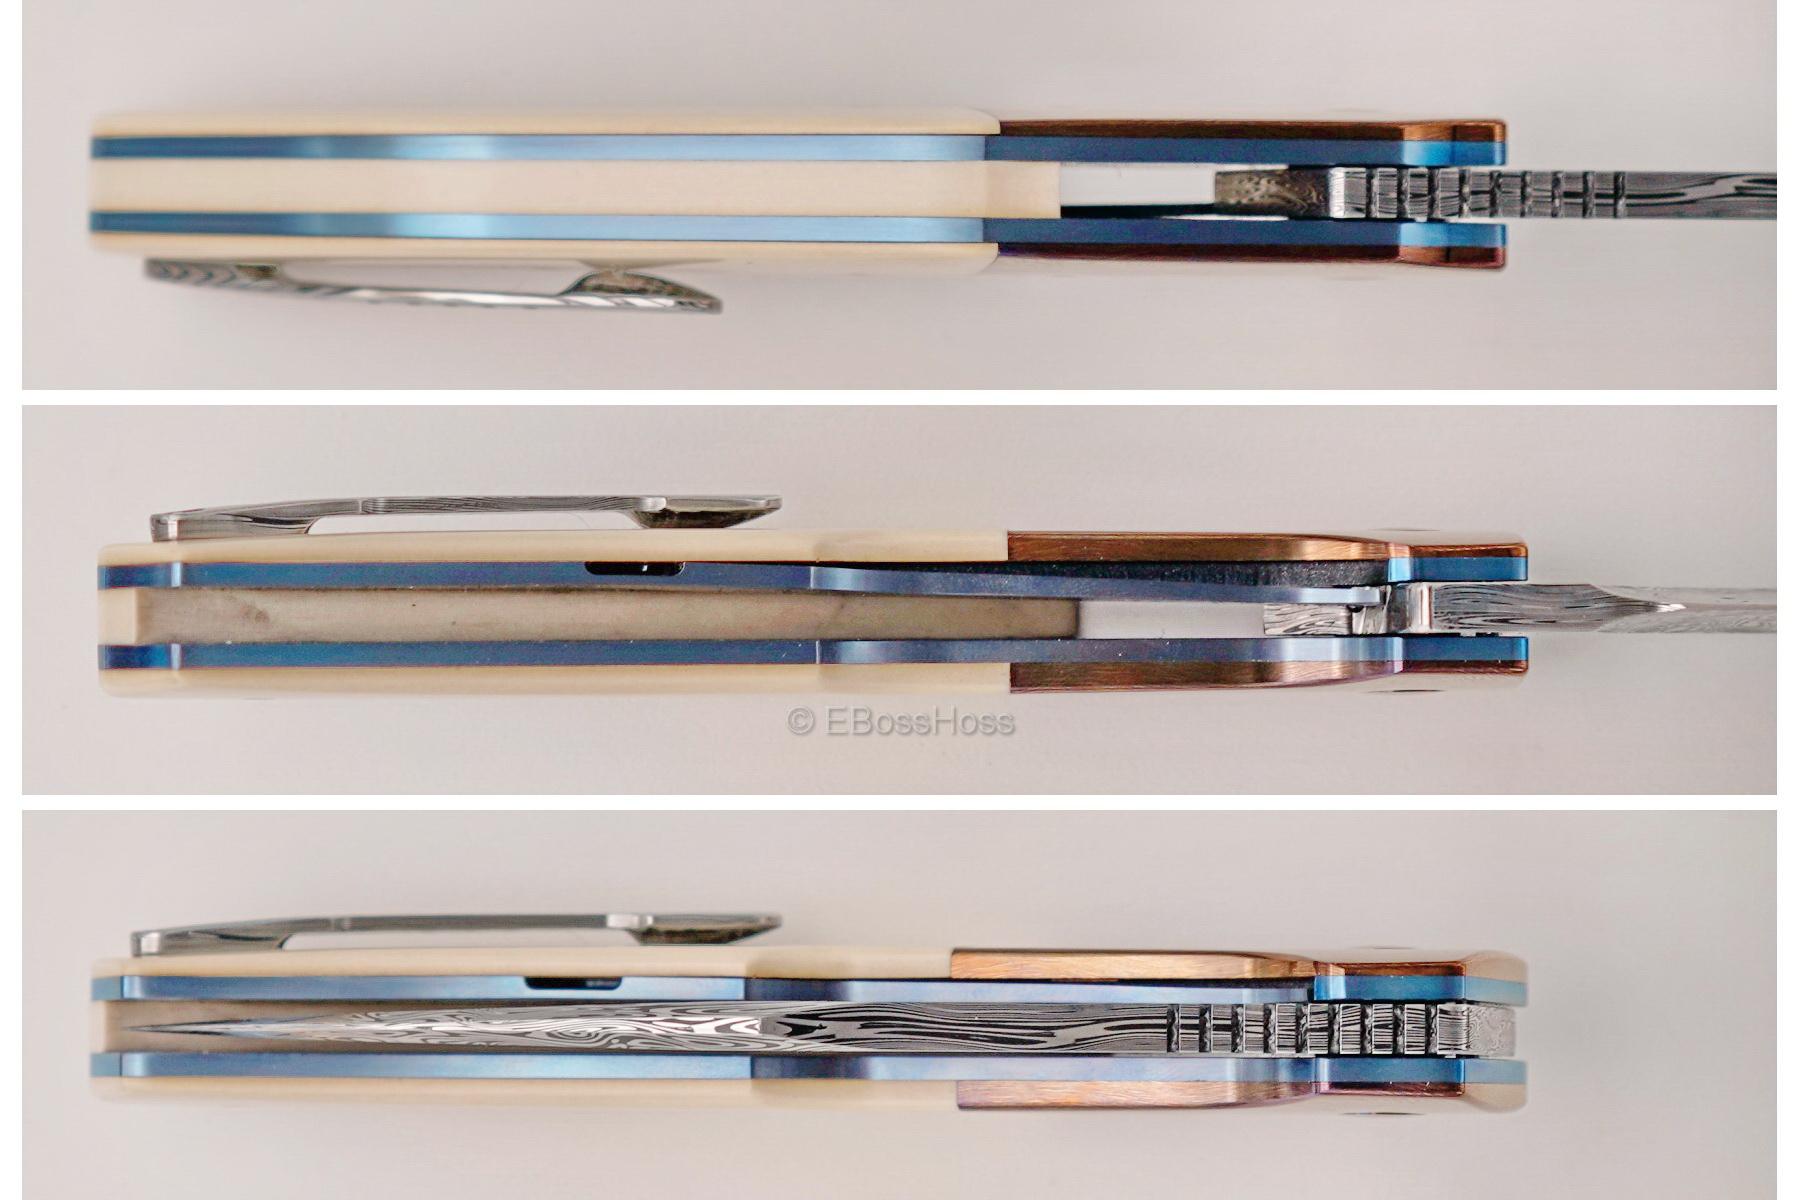 A2 Knives, Bharucha, Thorburn, van Heerden Custom A8 Premium Flipper